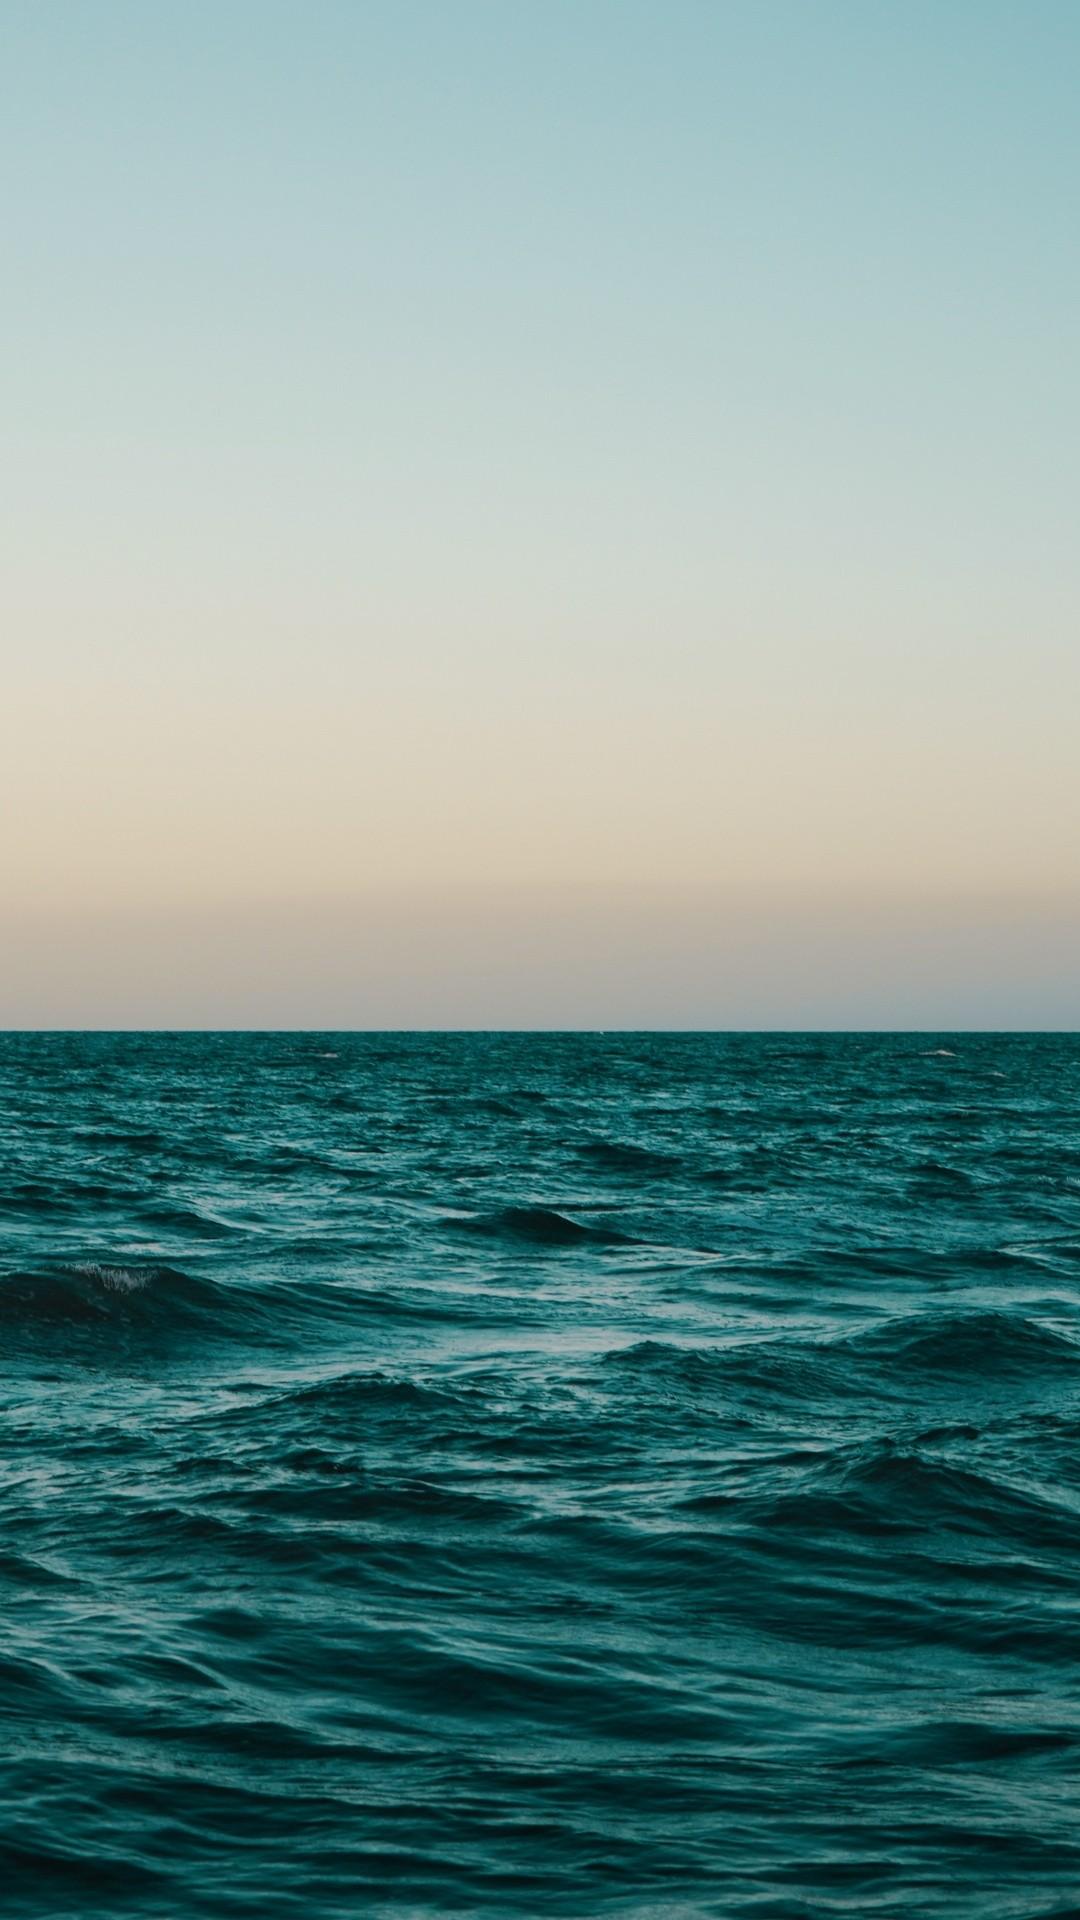 Ocean wallpaper for iphone